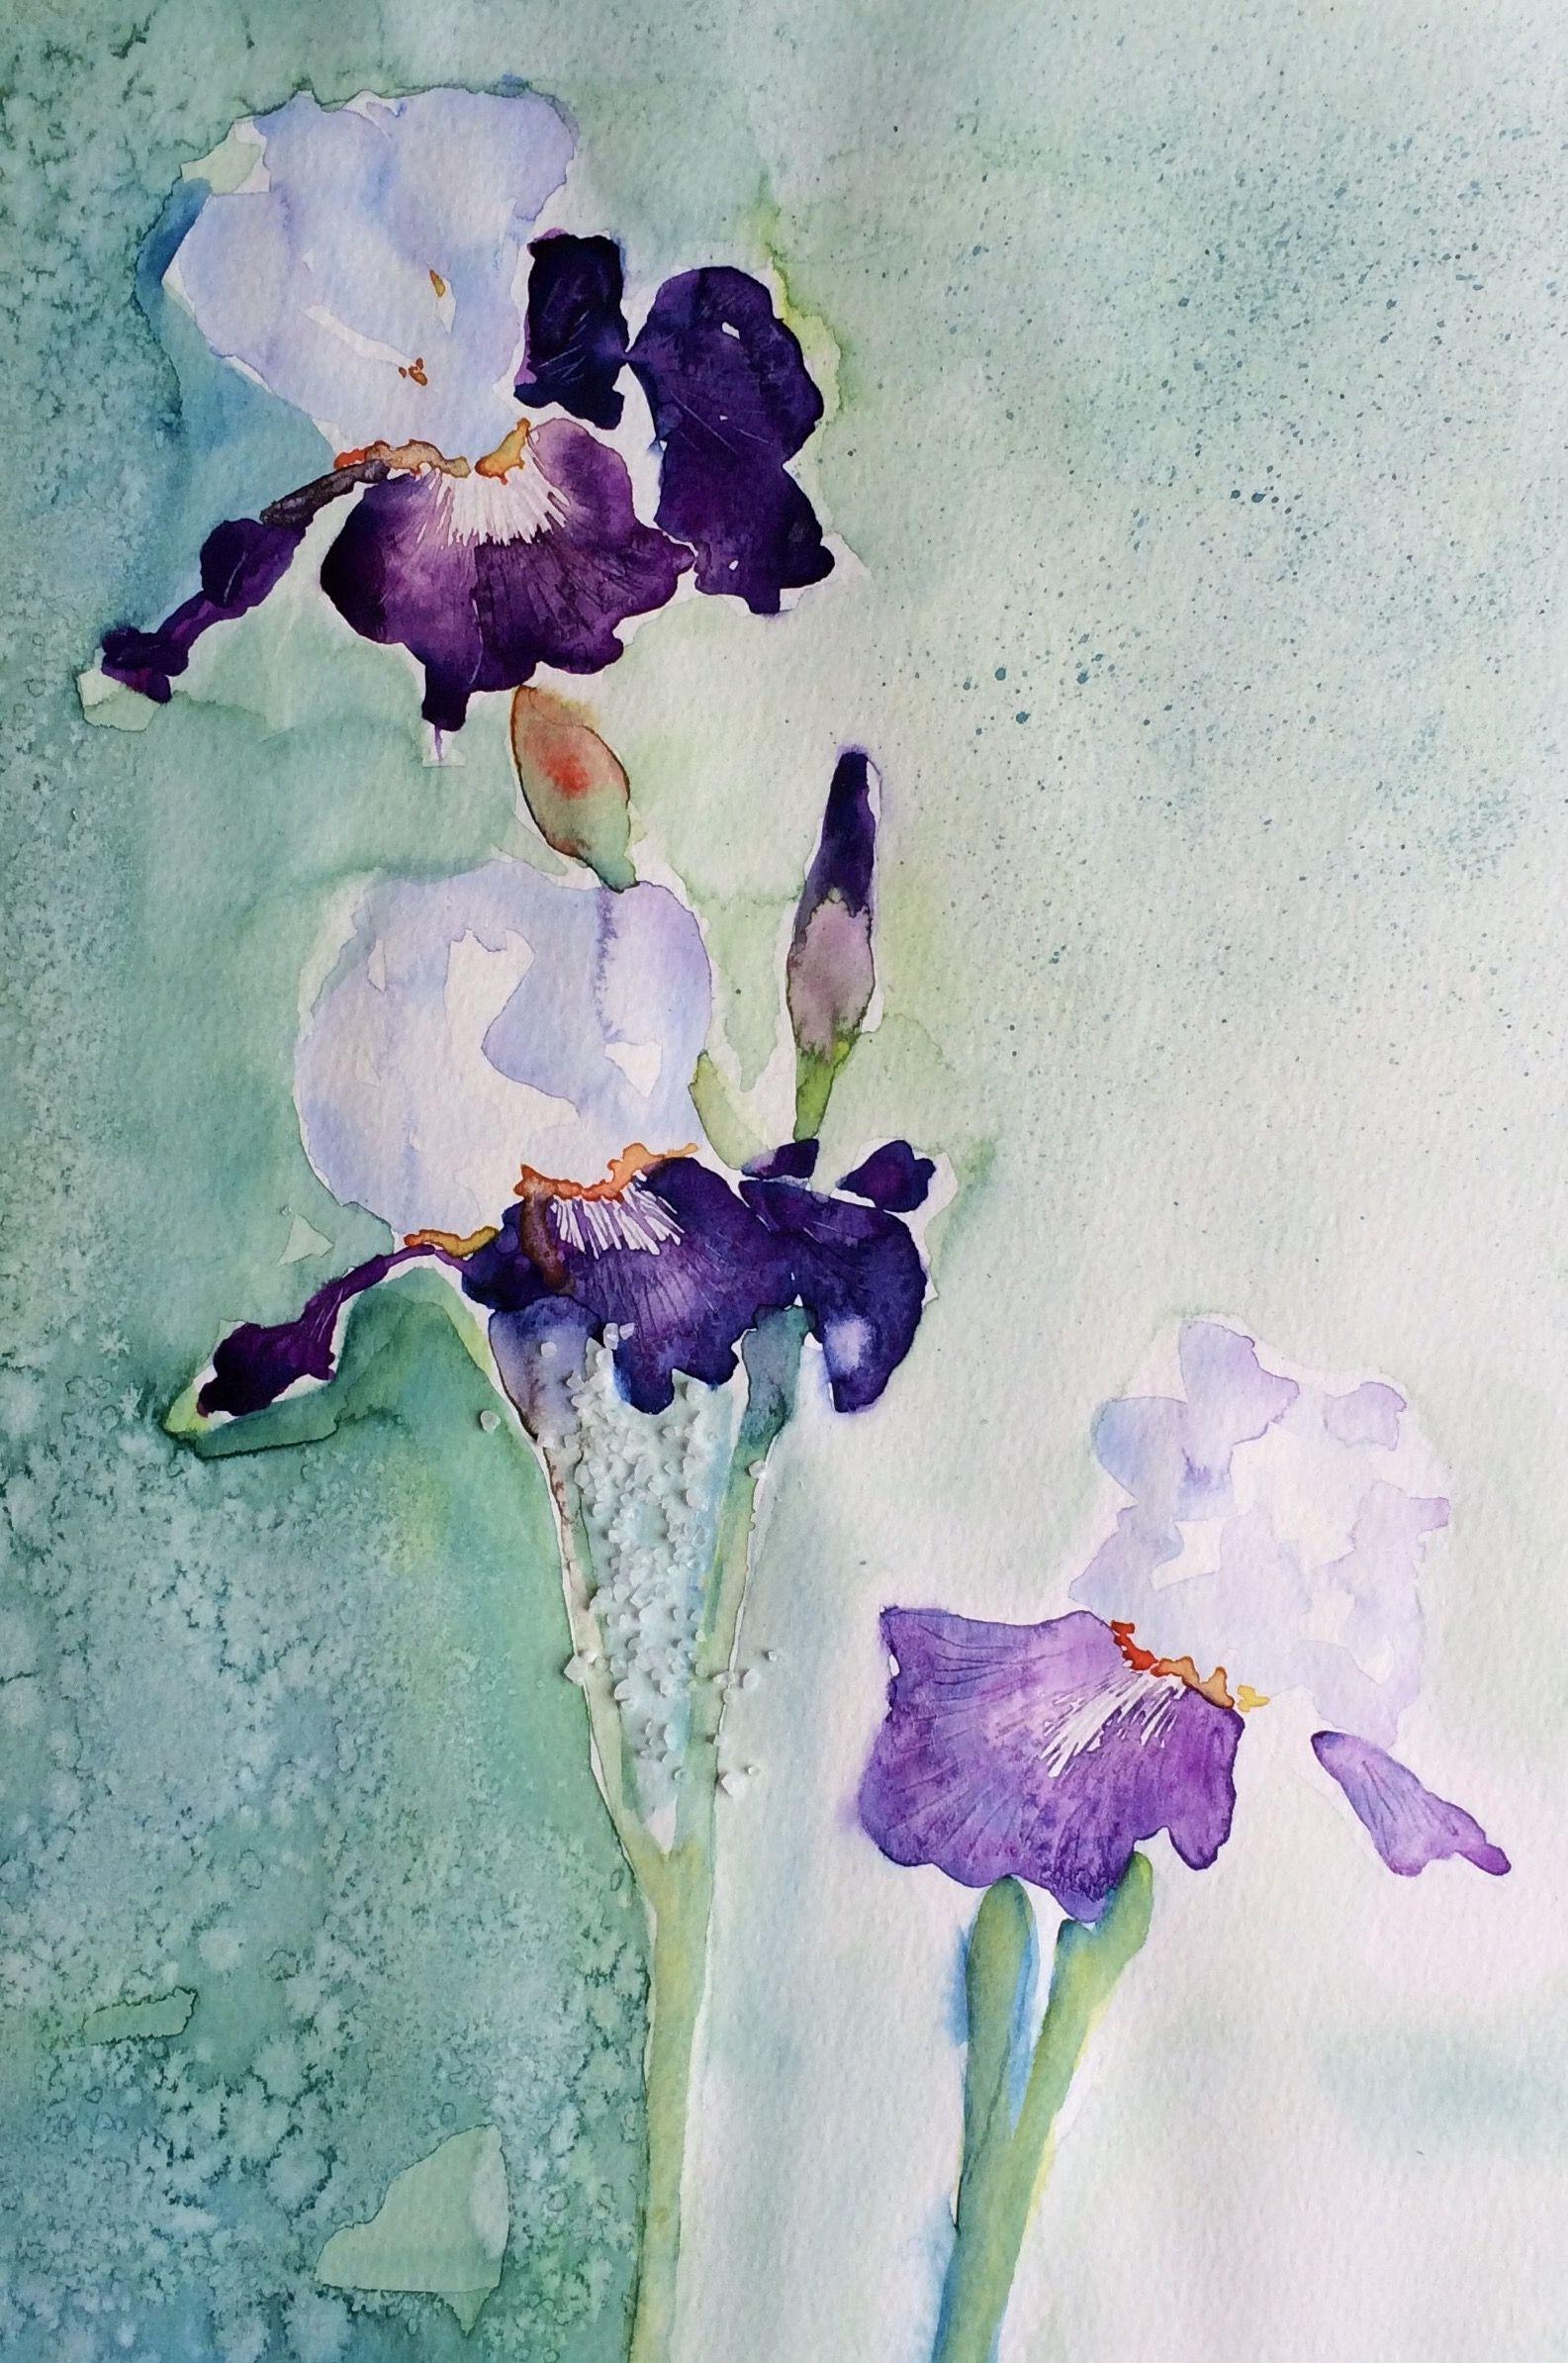 Aquarelle Iris Bleu Maxencebignier Aquarelle Peinture Et